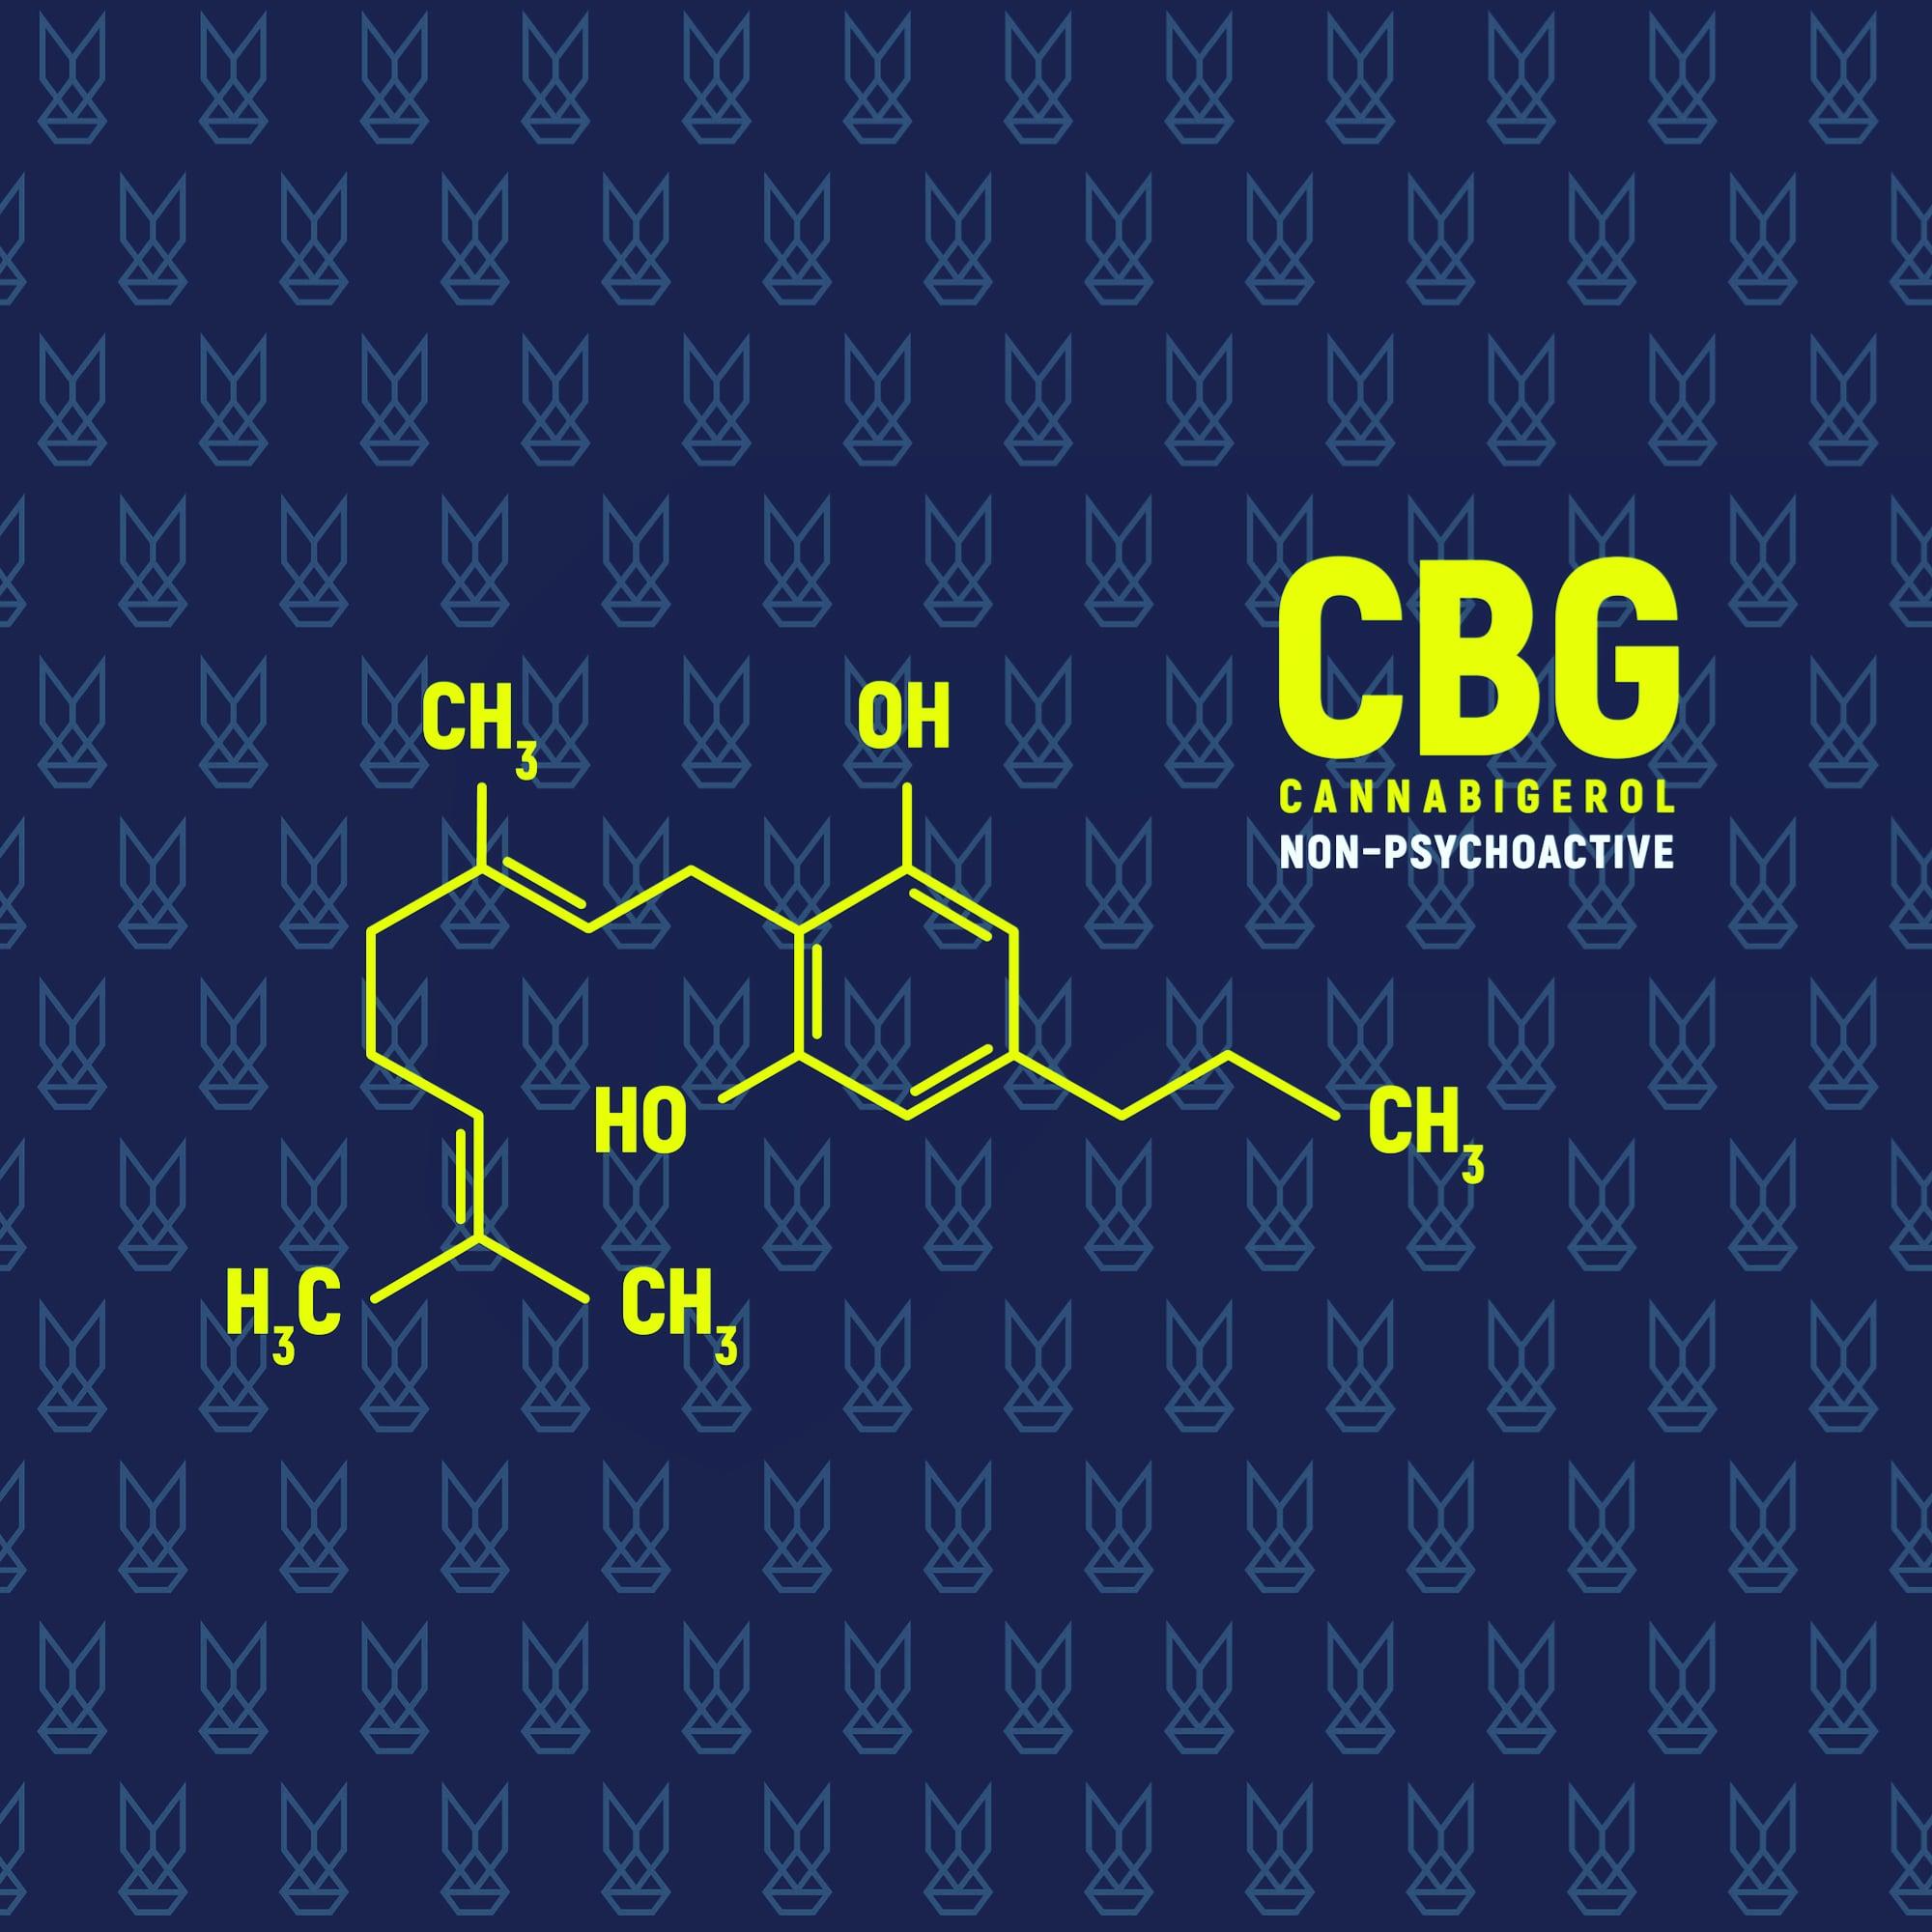 Co je CBG (Cannabigerol)?